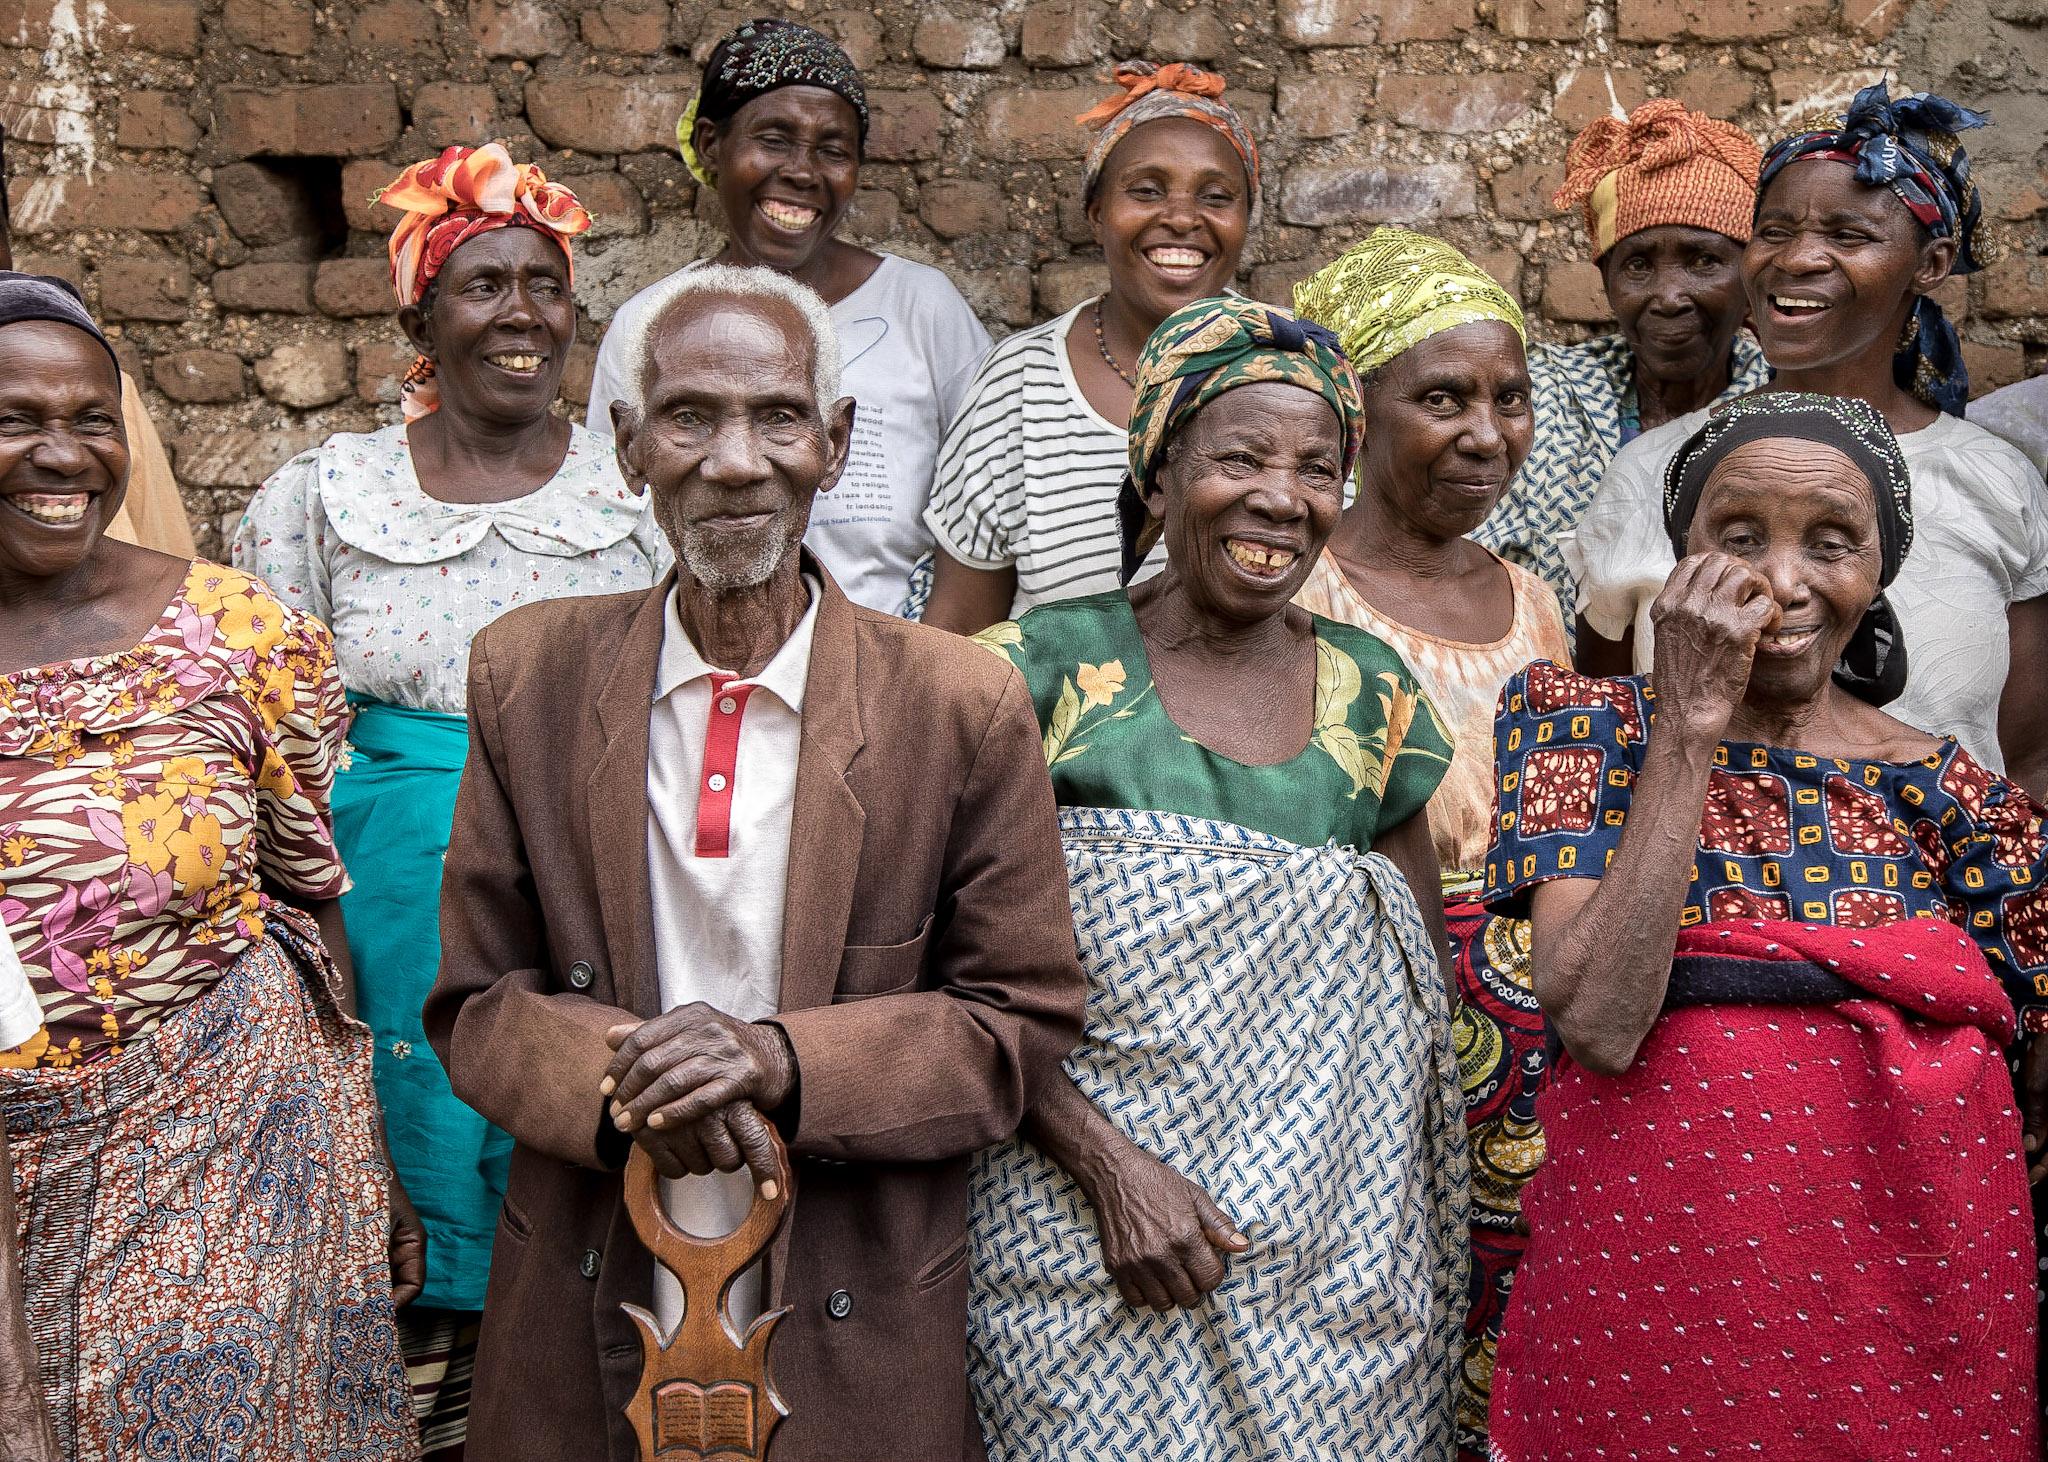 Adam Dickens 2017 - Deki Uganda - Kamasasa Cell - General 16.jpg